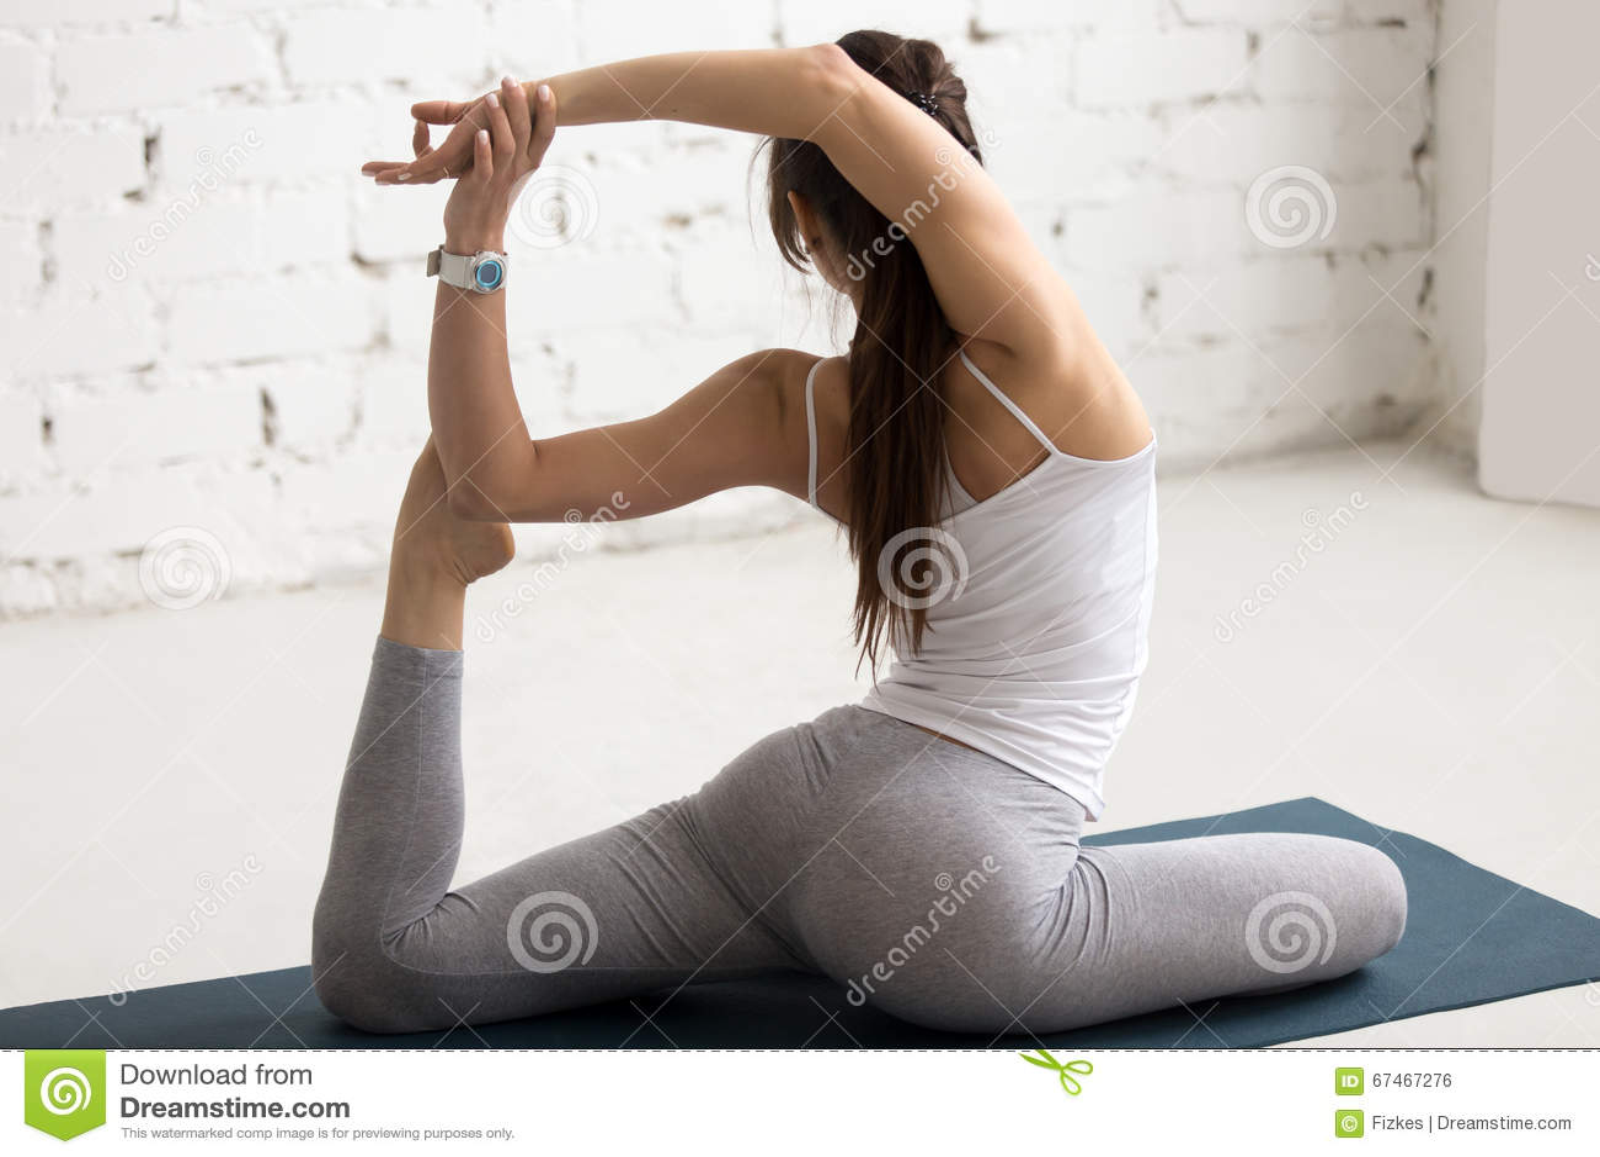 Yoga Zuhause: Meerjungfrau-Yoga-Haltung Stockfoto - Bild von ...